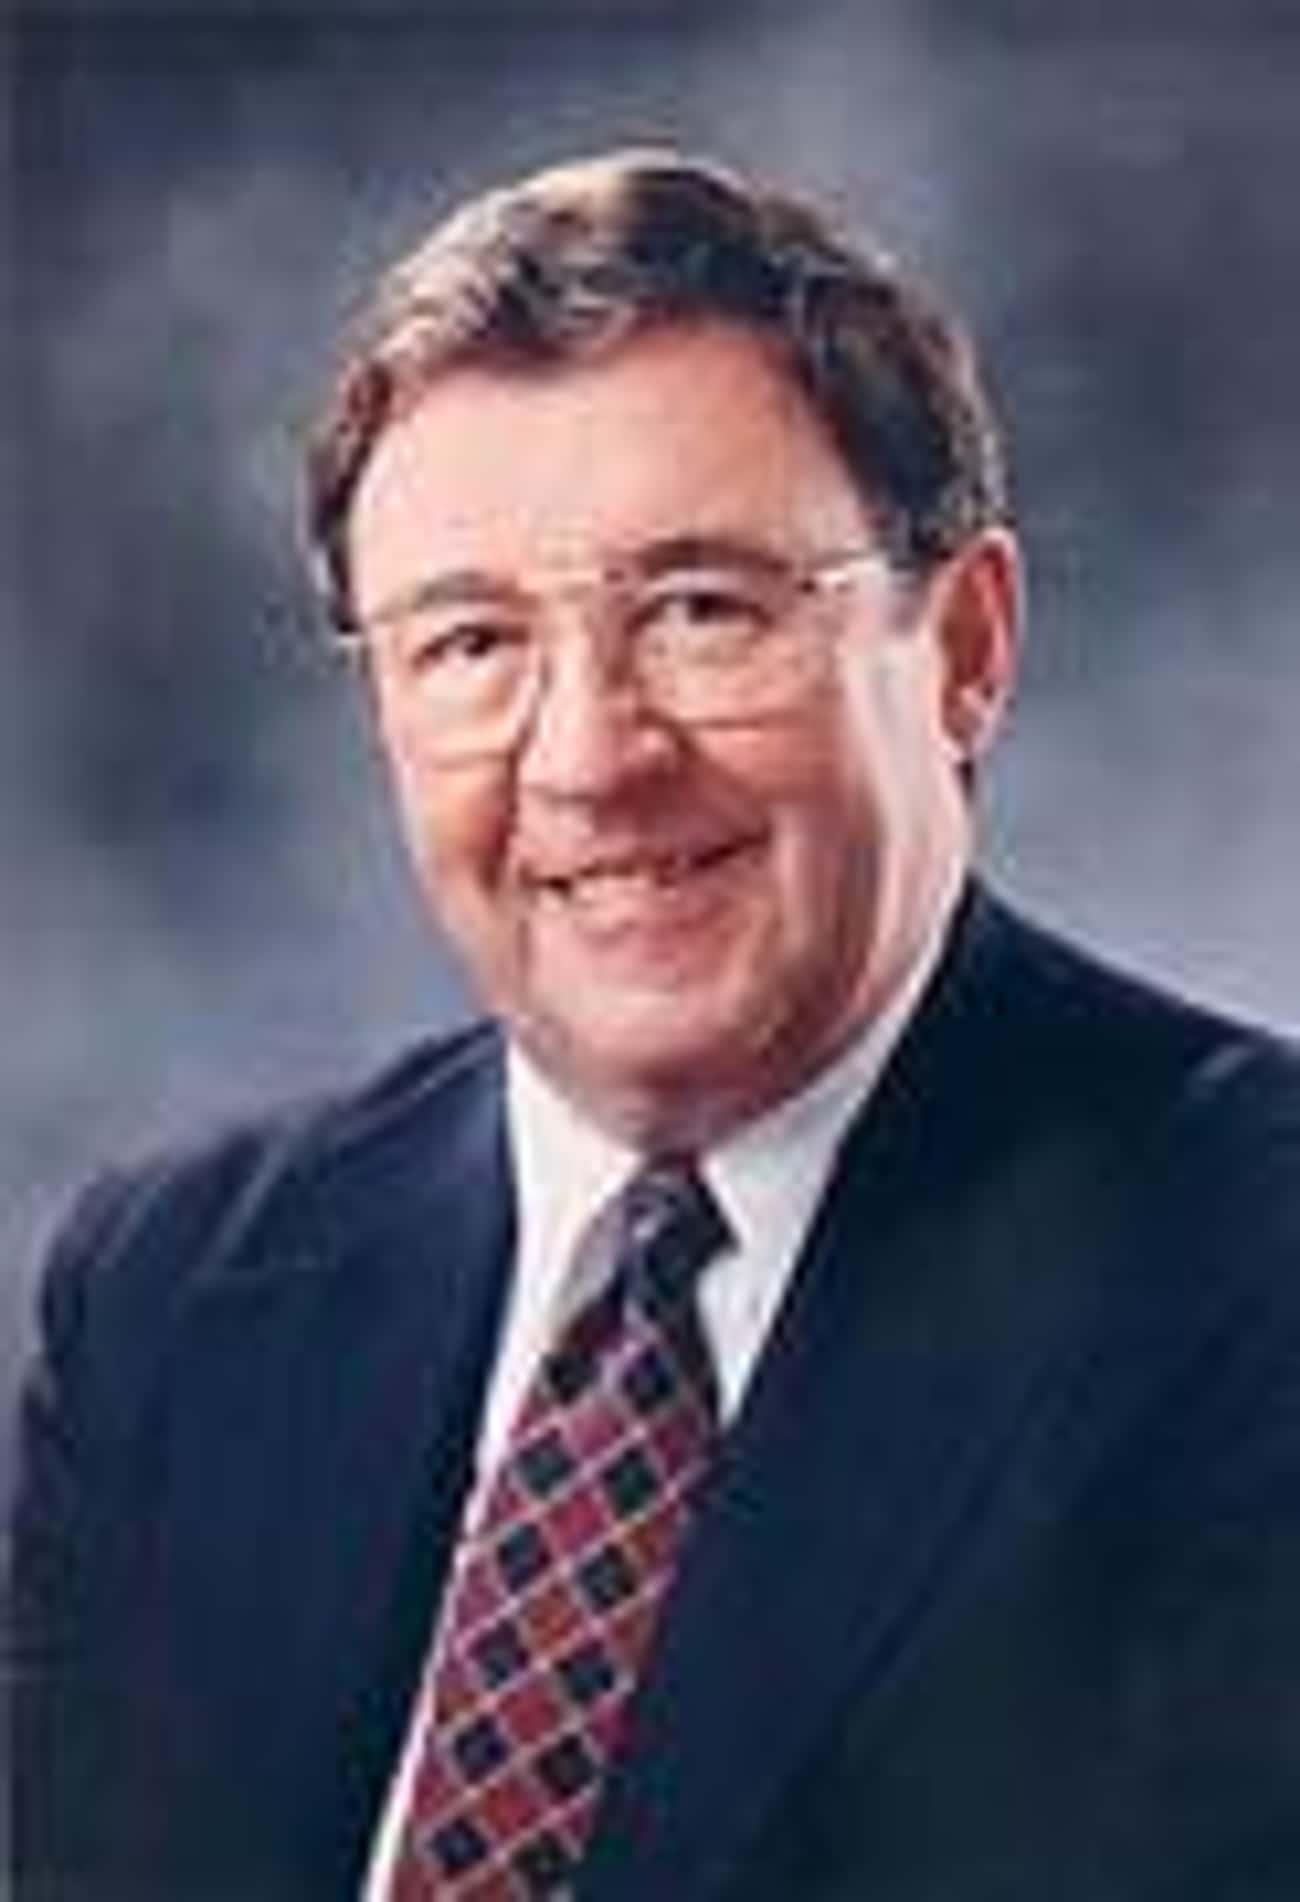 Thomas G. Cody